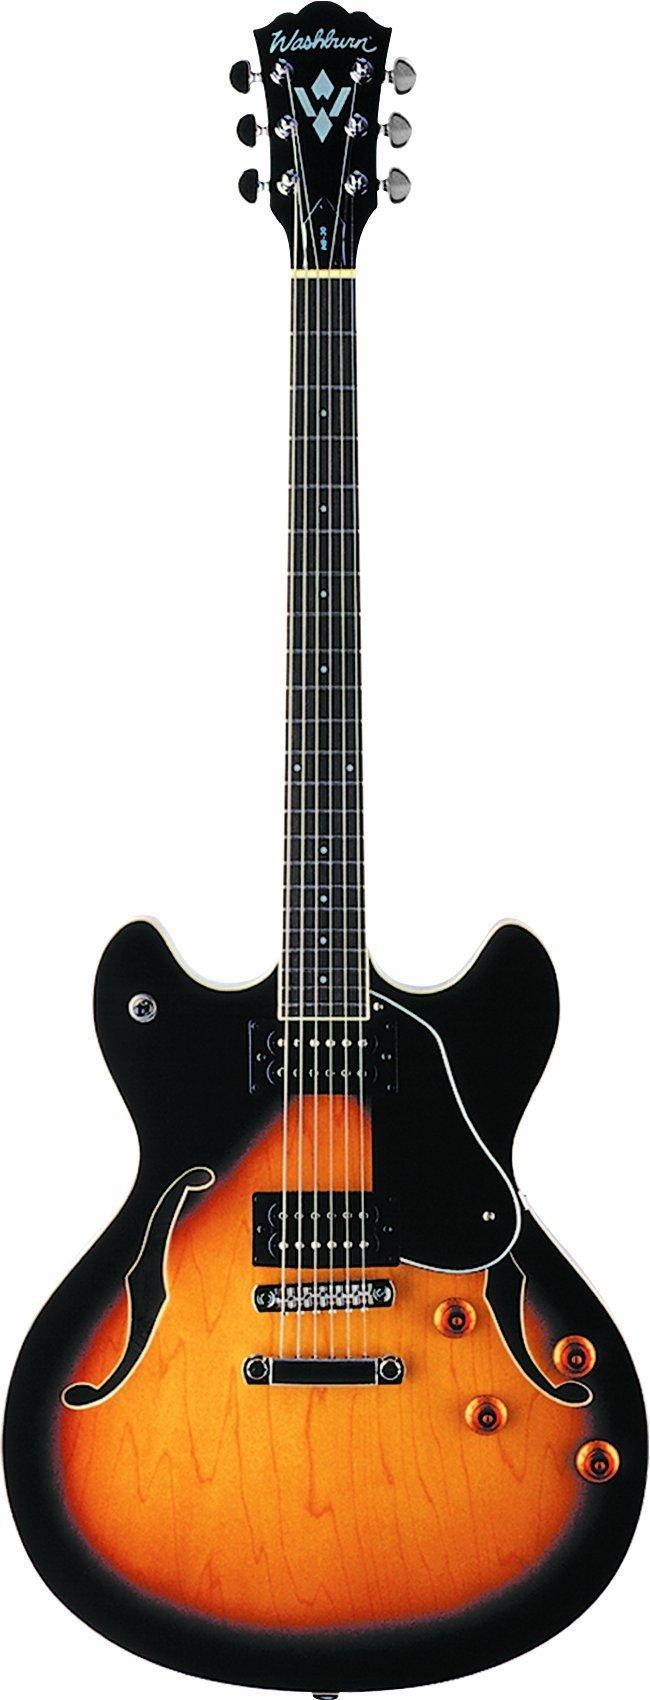 Washburn HB Series HB30TSK Electric Guitar